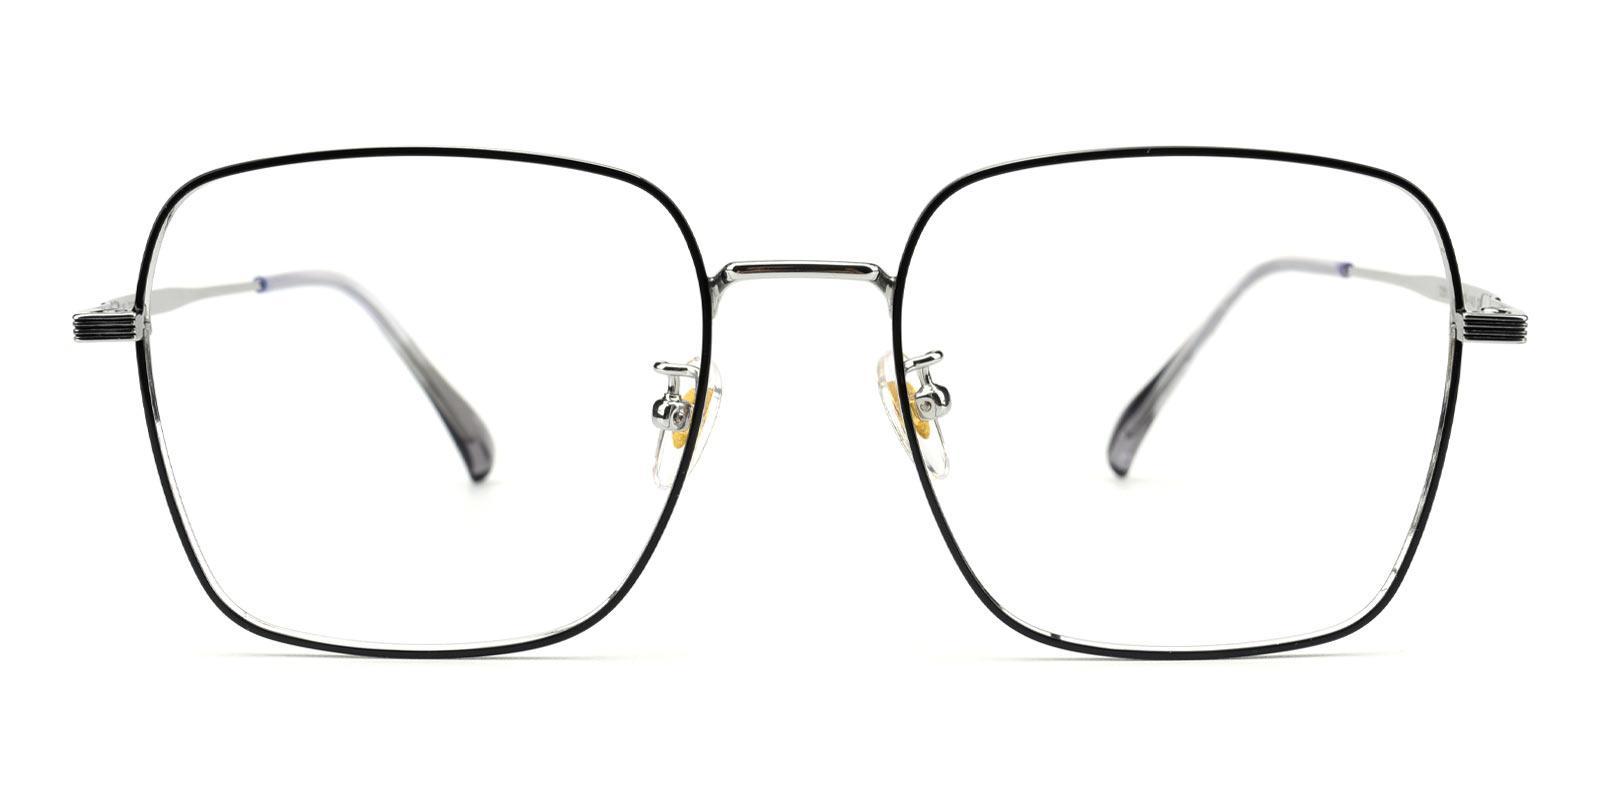 Joa-Black-Square-Titanium-Eyeglasses-additional2